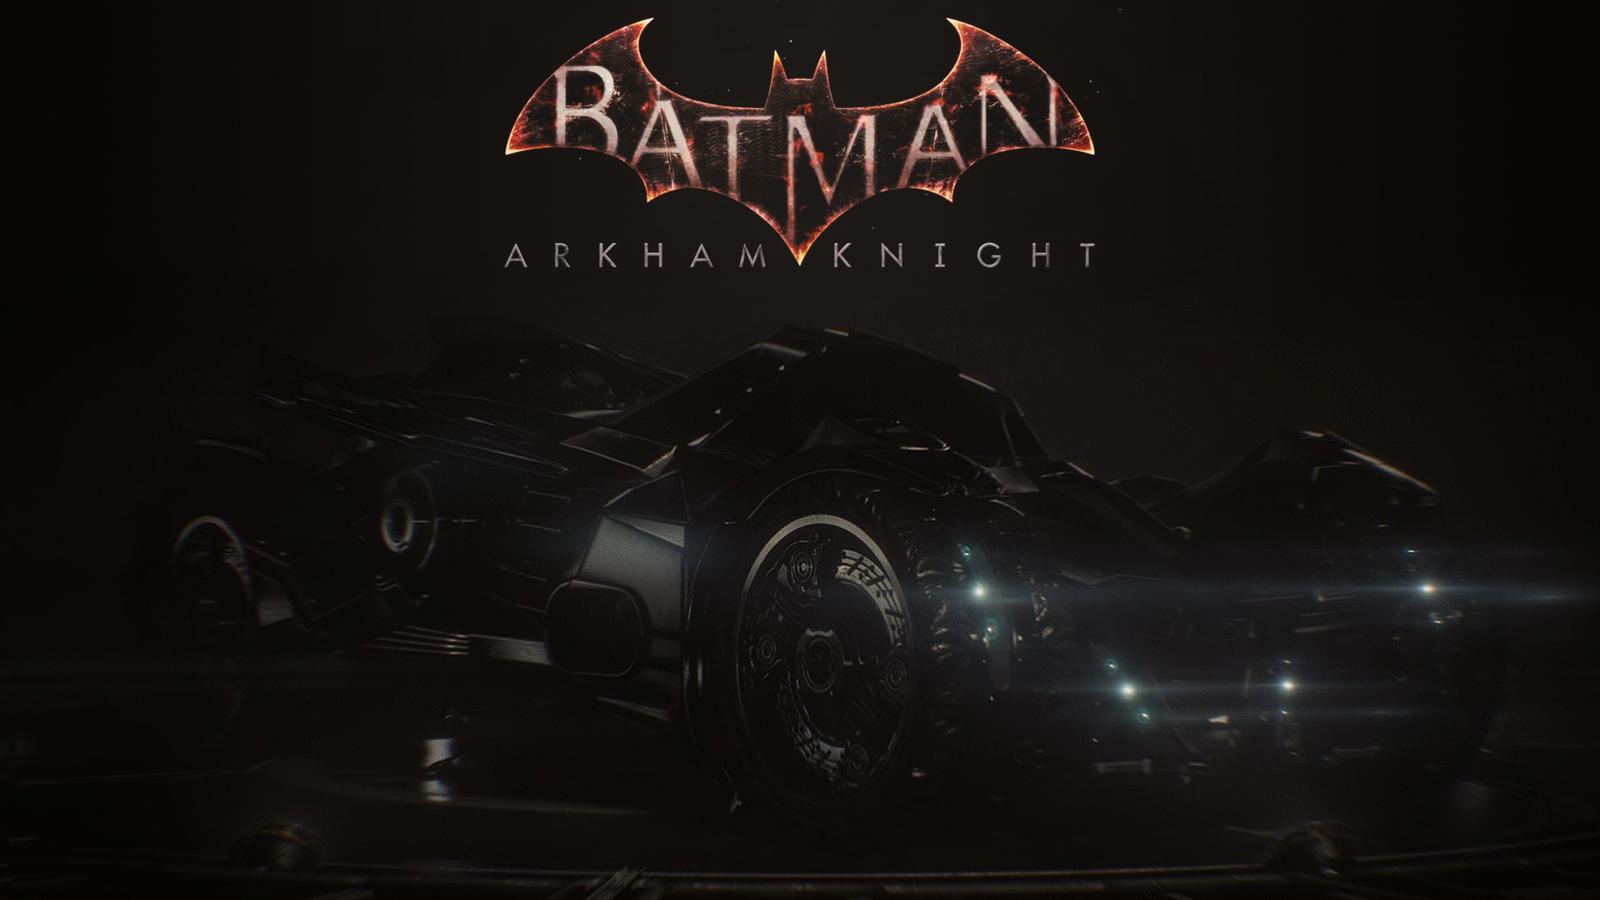 Arkham Knight Batmobile Wallpaper by heyPierce on DeviantArt